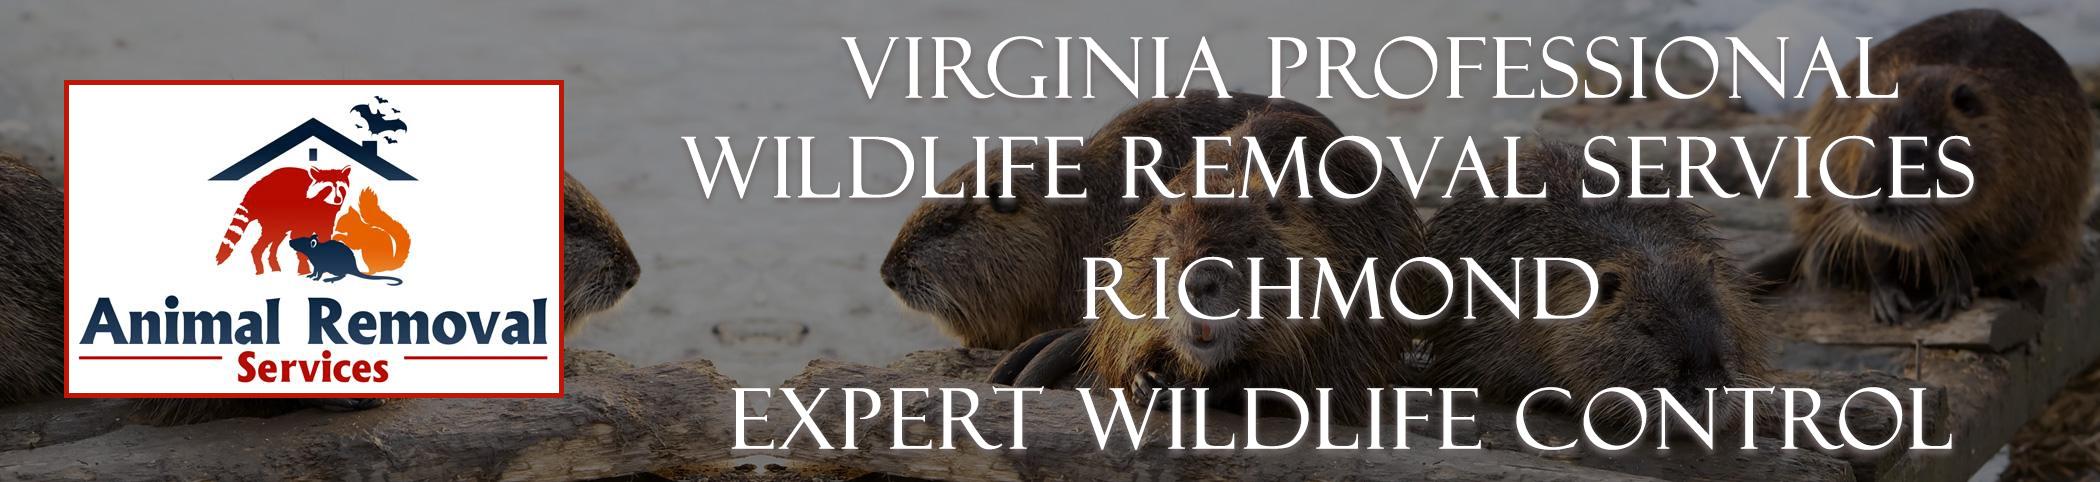 Virginia-Professional-Wildlife-Removal-Services-Richmond